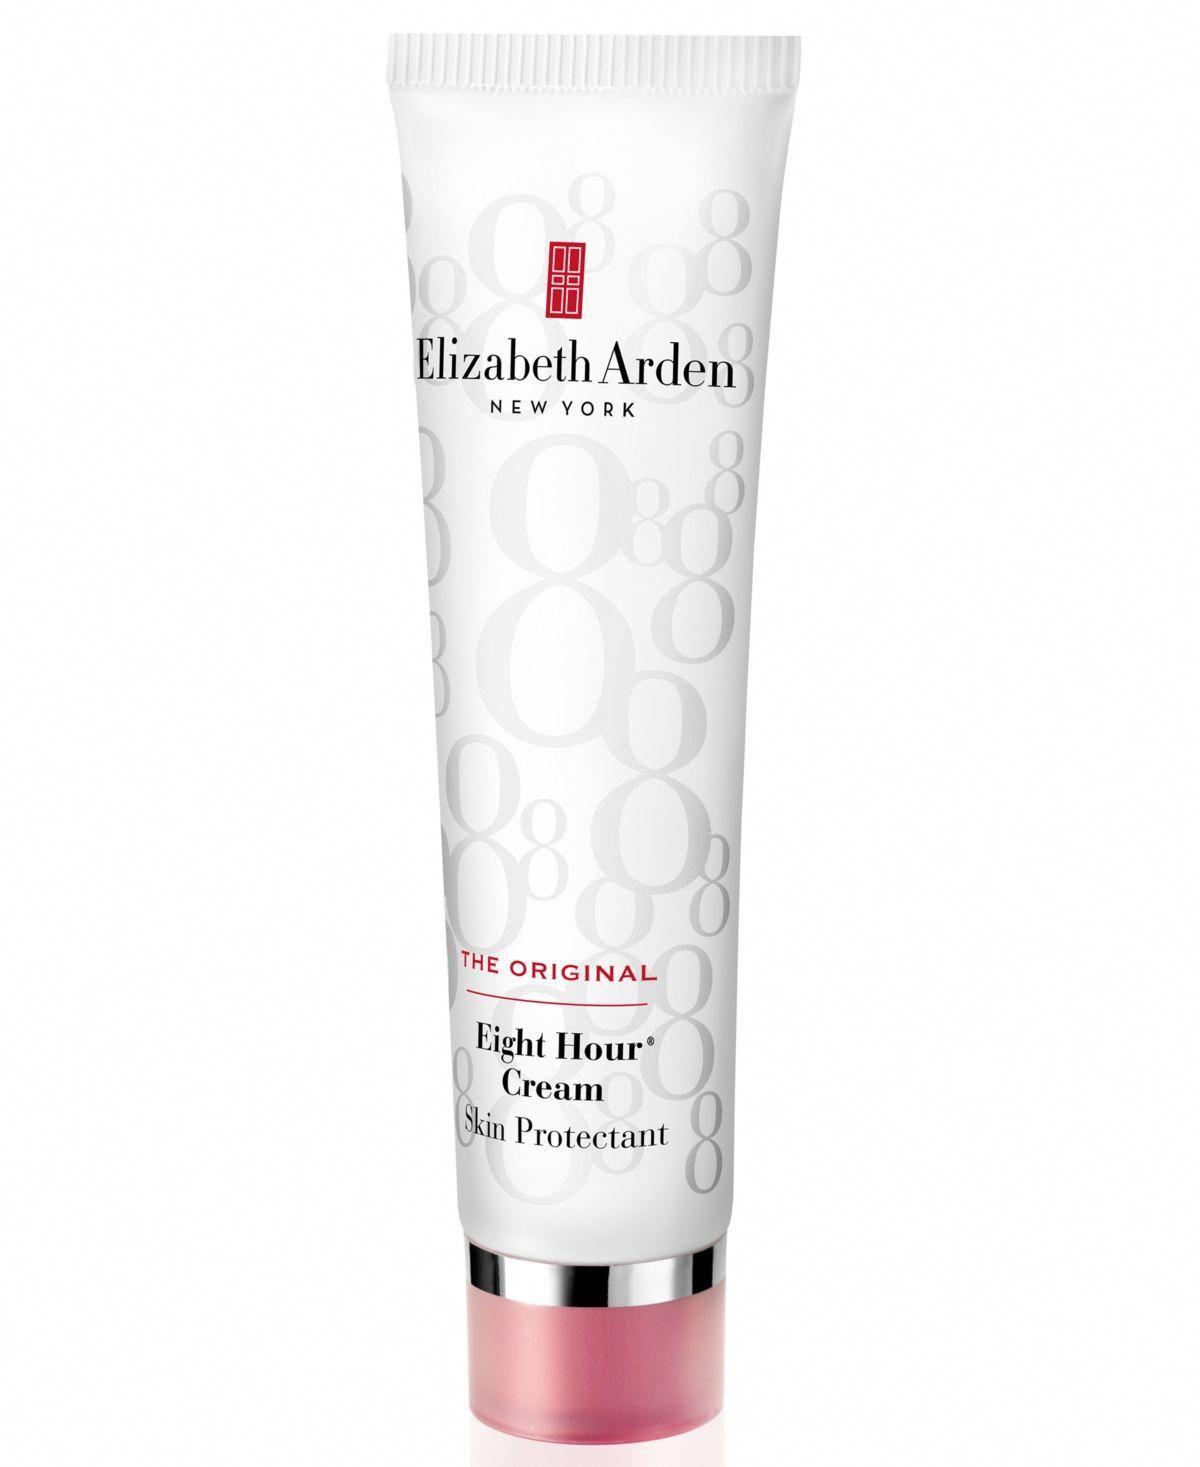 Elizabeth Arden Eight Hour Cream Skin Protectant The Original 1 7 Oz Almondoileyelashes In 2020 Skin Cream Skin Cleanser Products Skin Protection